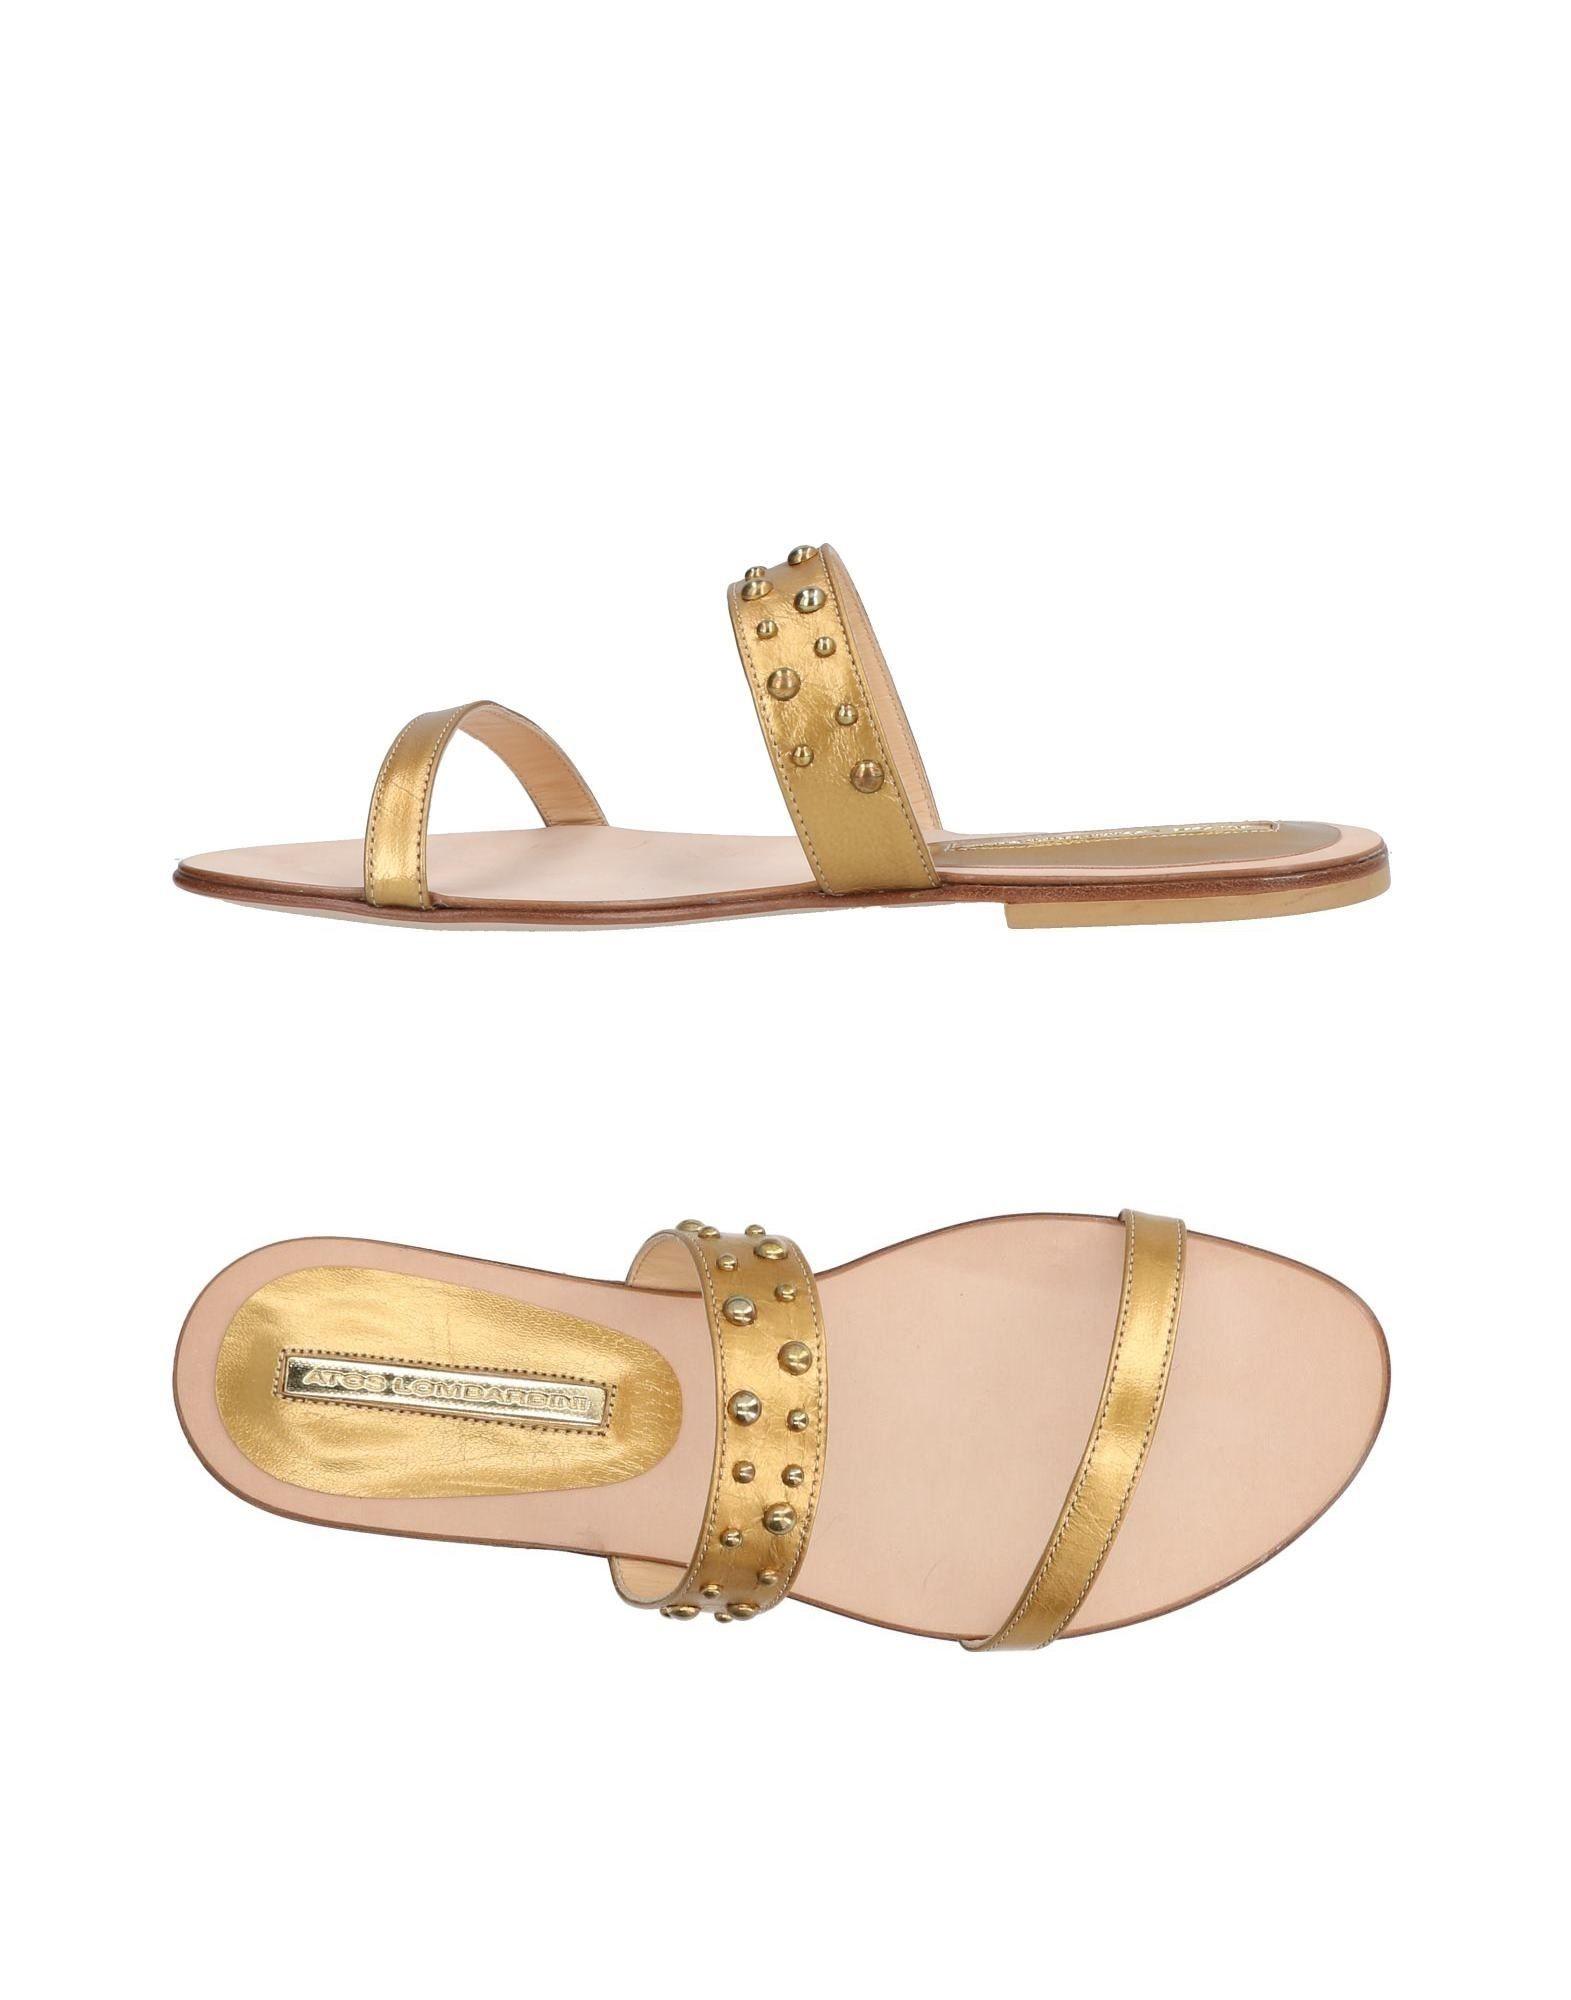 Atos Lombardini Lombardini Sandals - Women Atos Lombardini Lombardini Sandals online on  Canada - 11454467OI f4442e